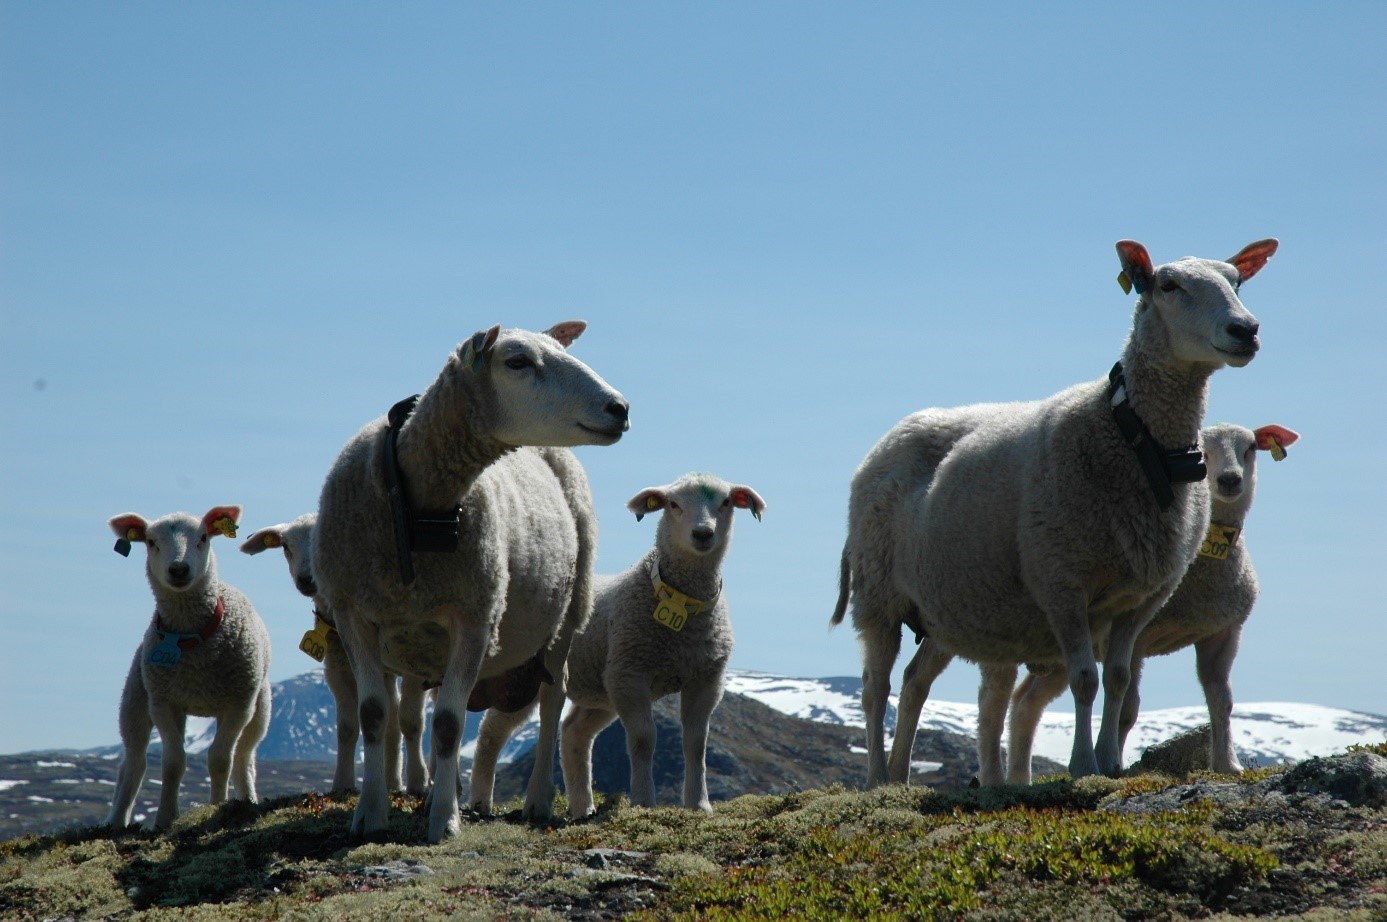 Domestic sheep grazing in alpine tundra of Norway.